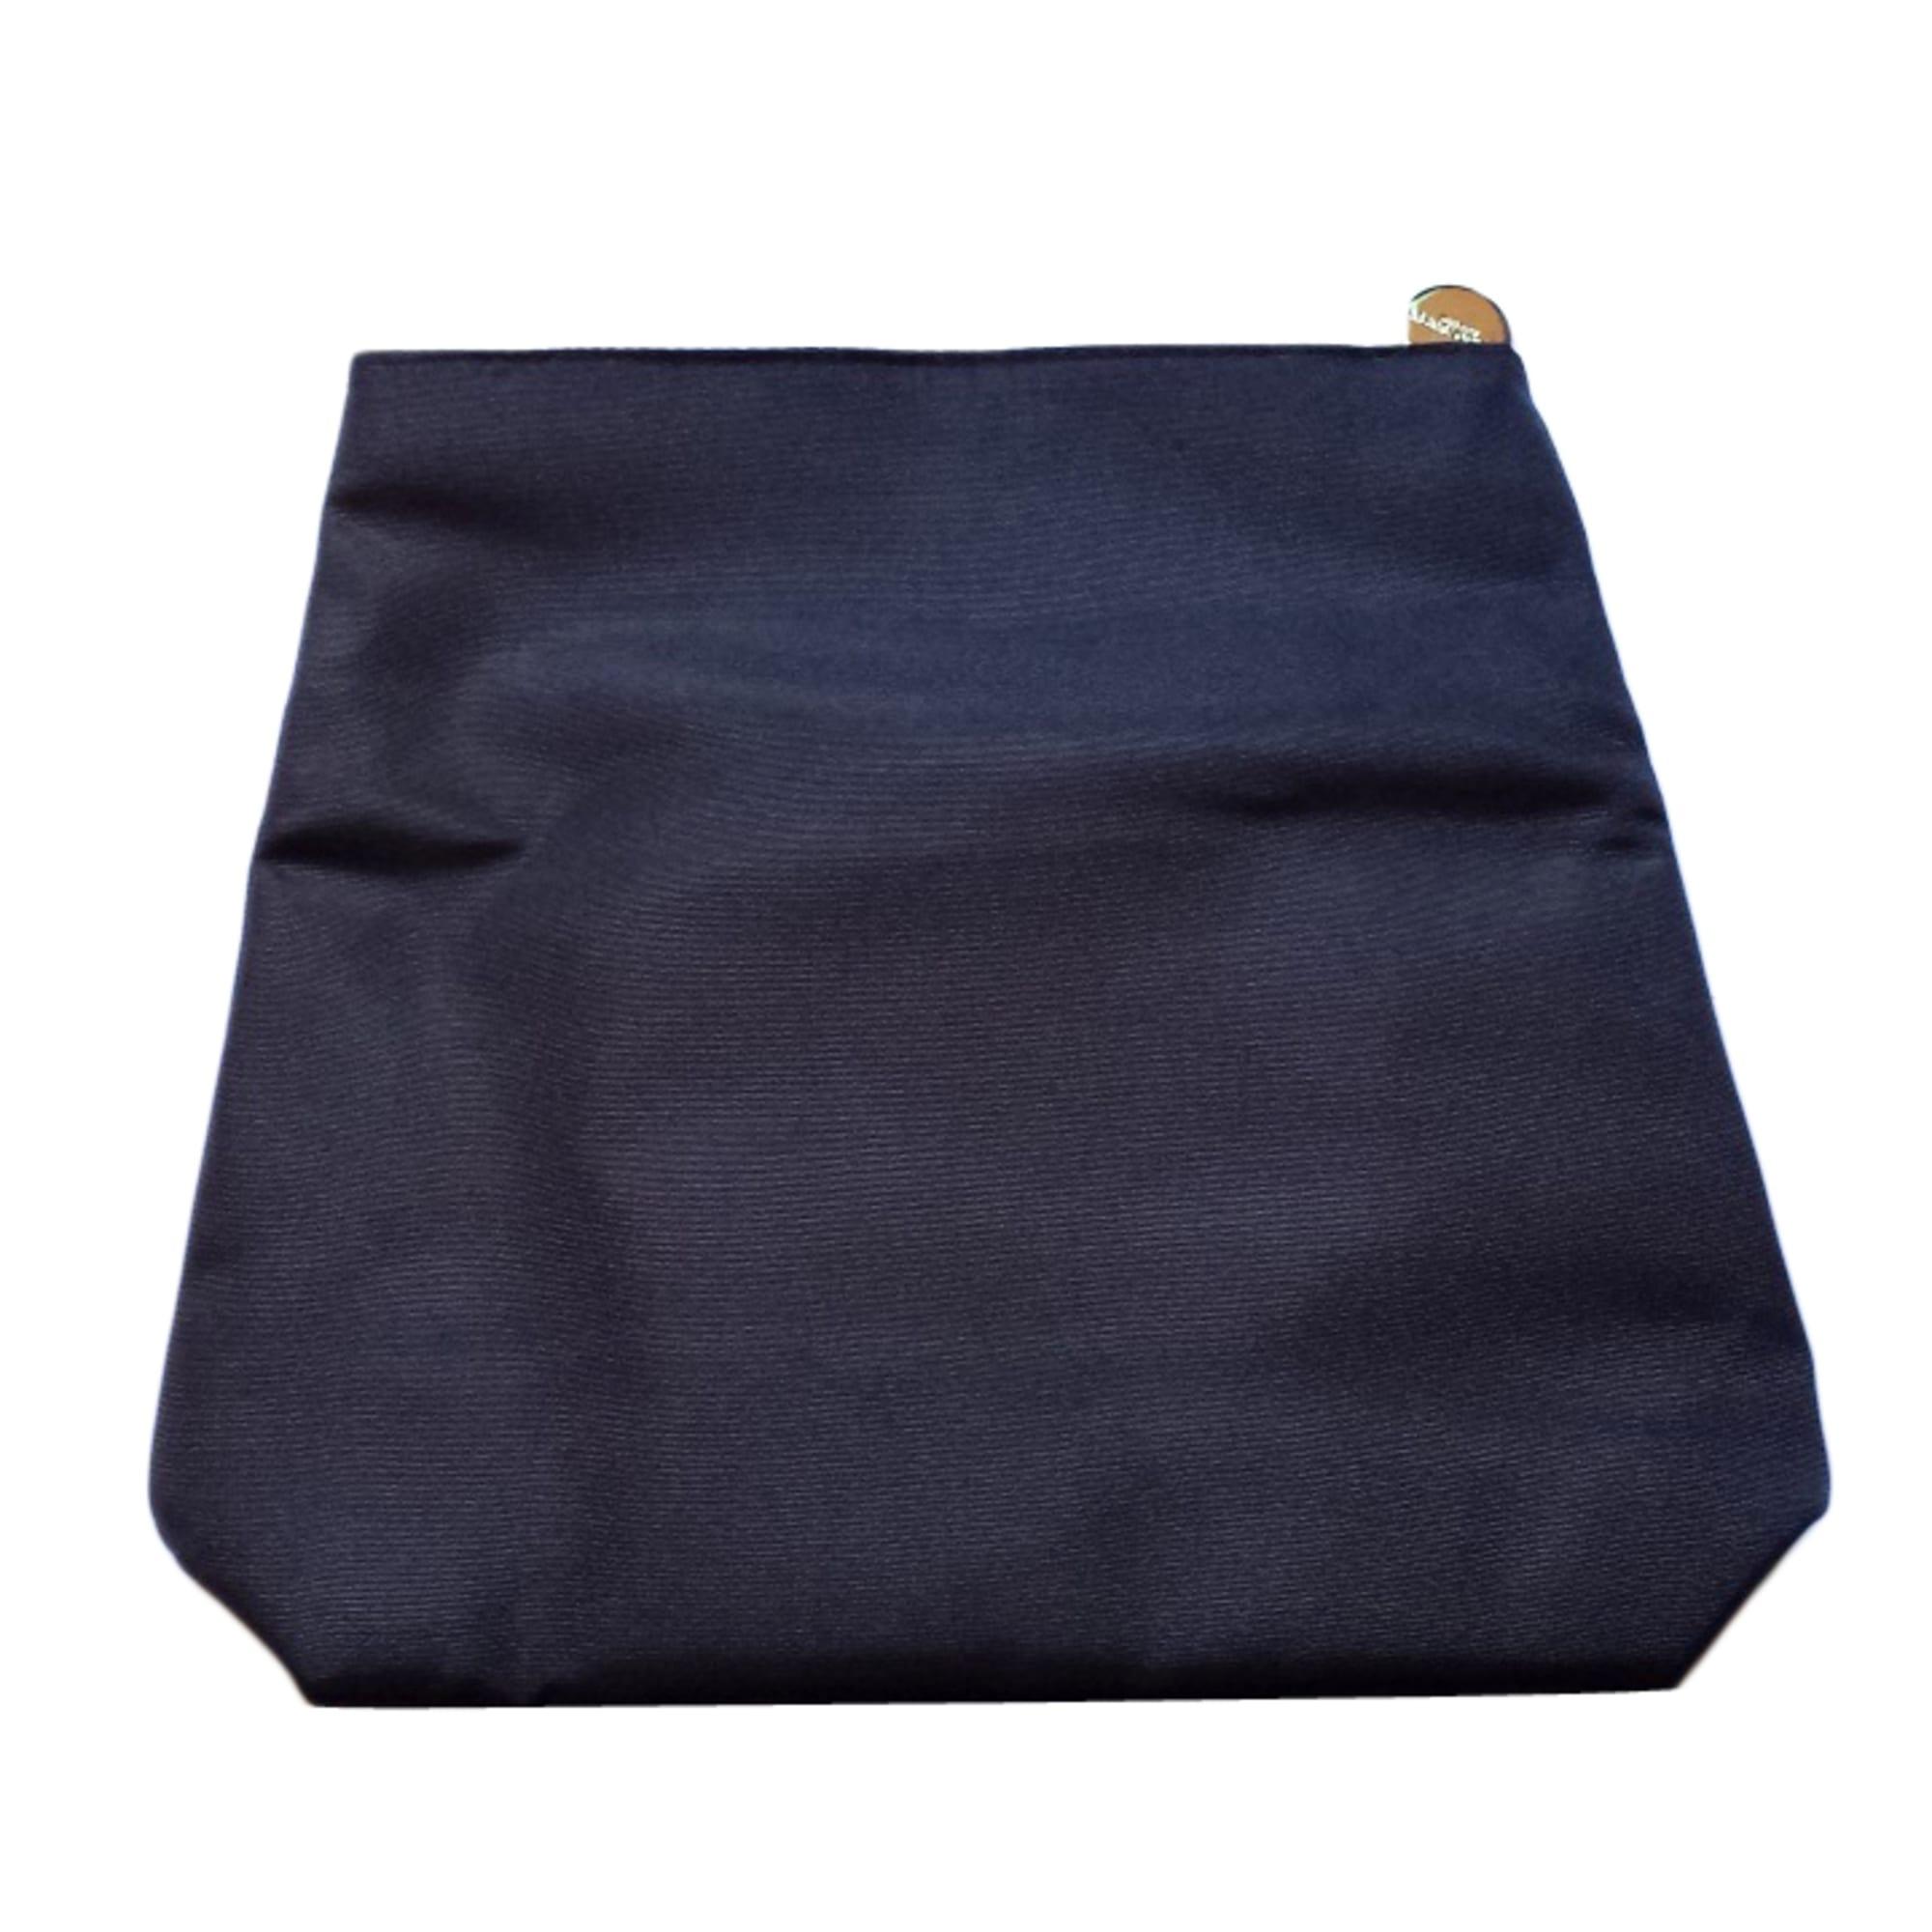 Sac pochette en tissu GIORGIO ARMANI tissu noir